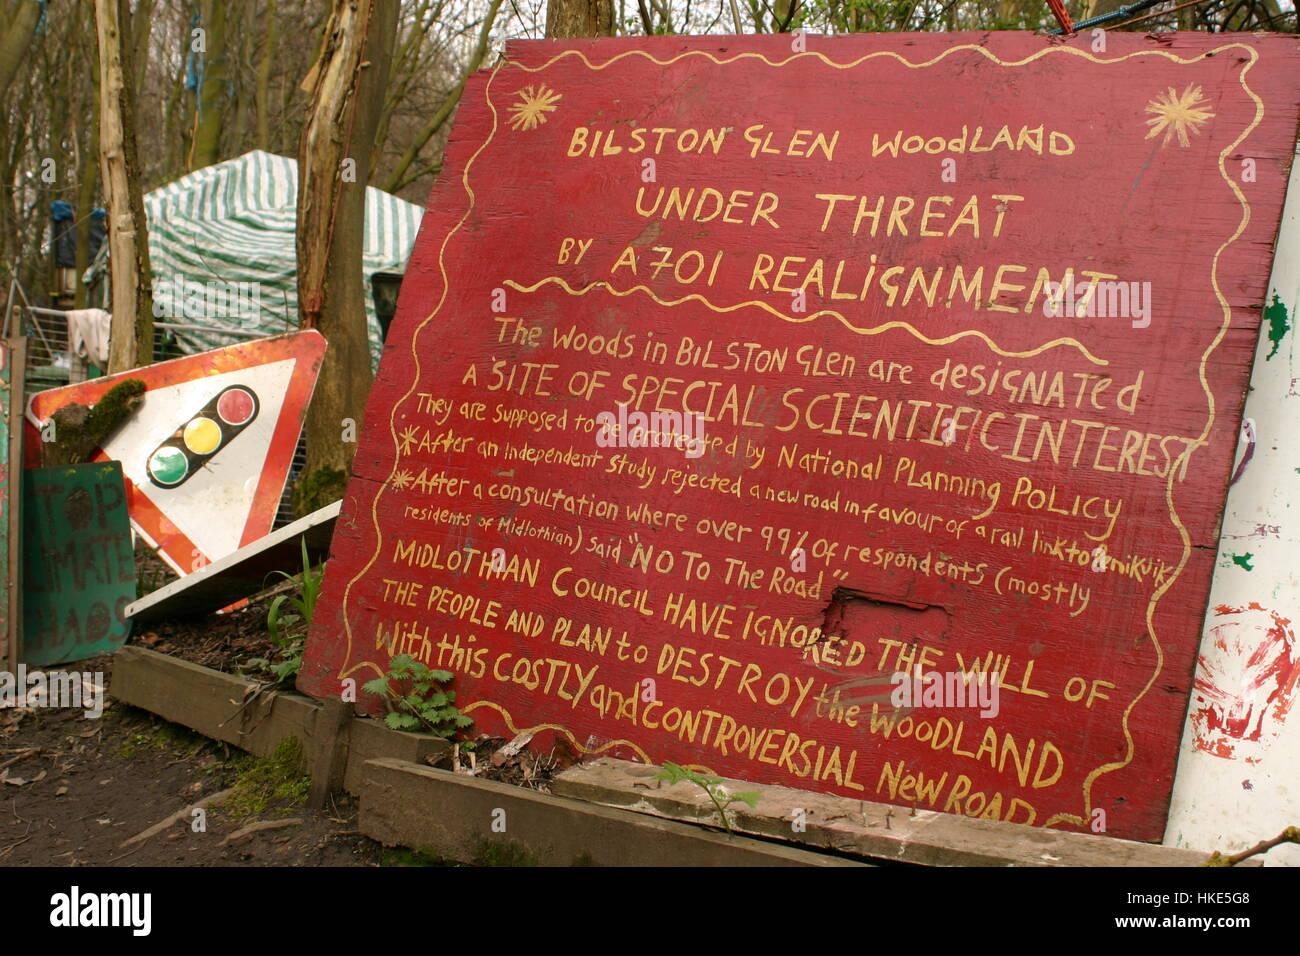 Signs at bilston Glen, Scotland, protest site Stock Photo